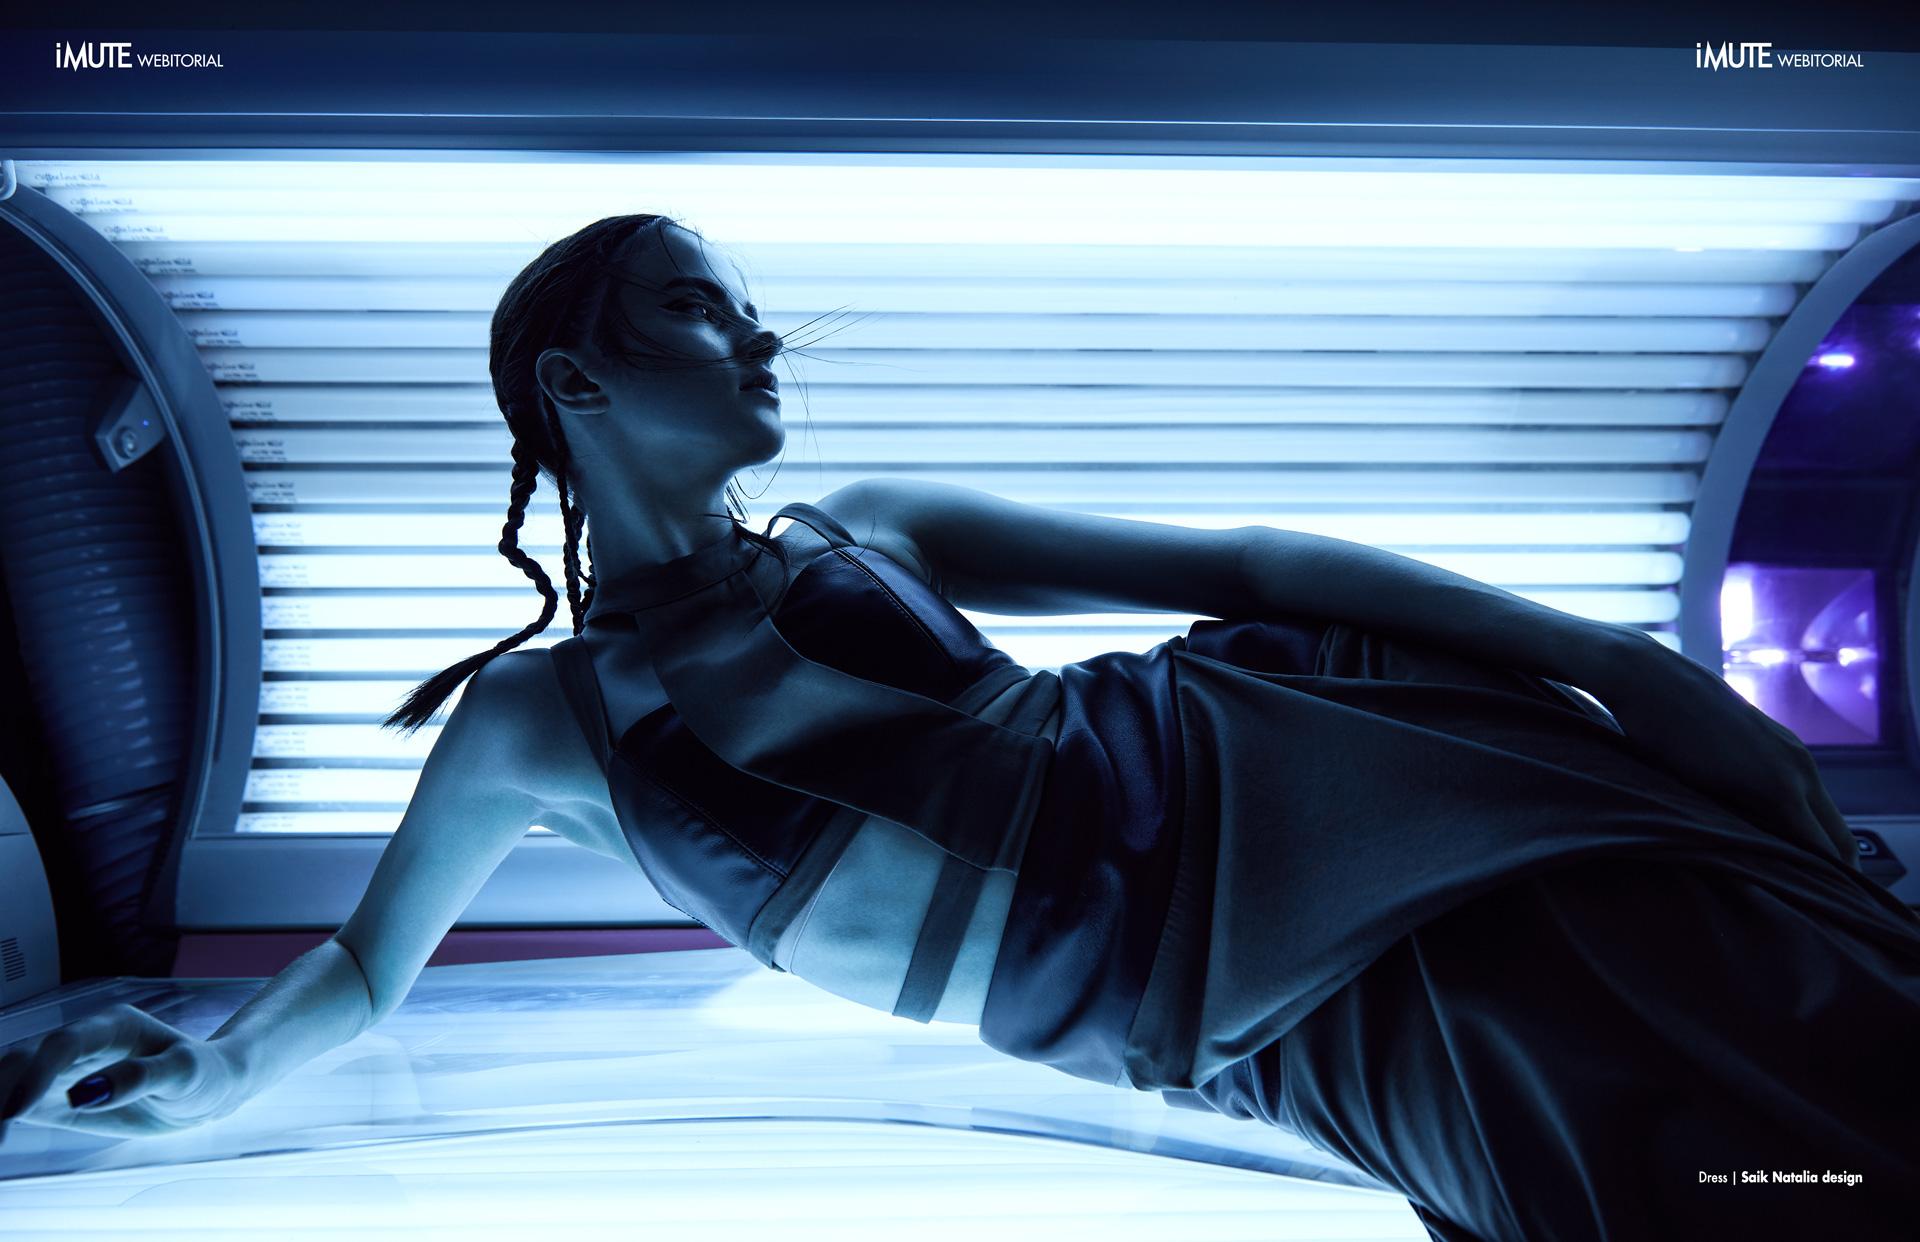 Ultraviolet webitorial for iMute Magazine Photographer|Konstantin Borysenko Model| Bogdana Nevodnik @2amodels Stylist|Tetiana Shestorkina Makeup|Margarita Hait Hair|Tanya Belik